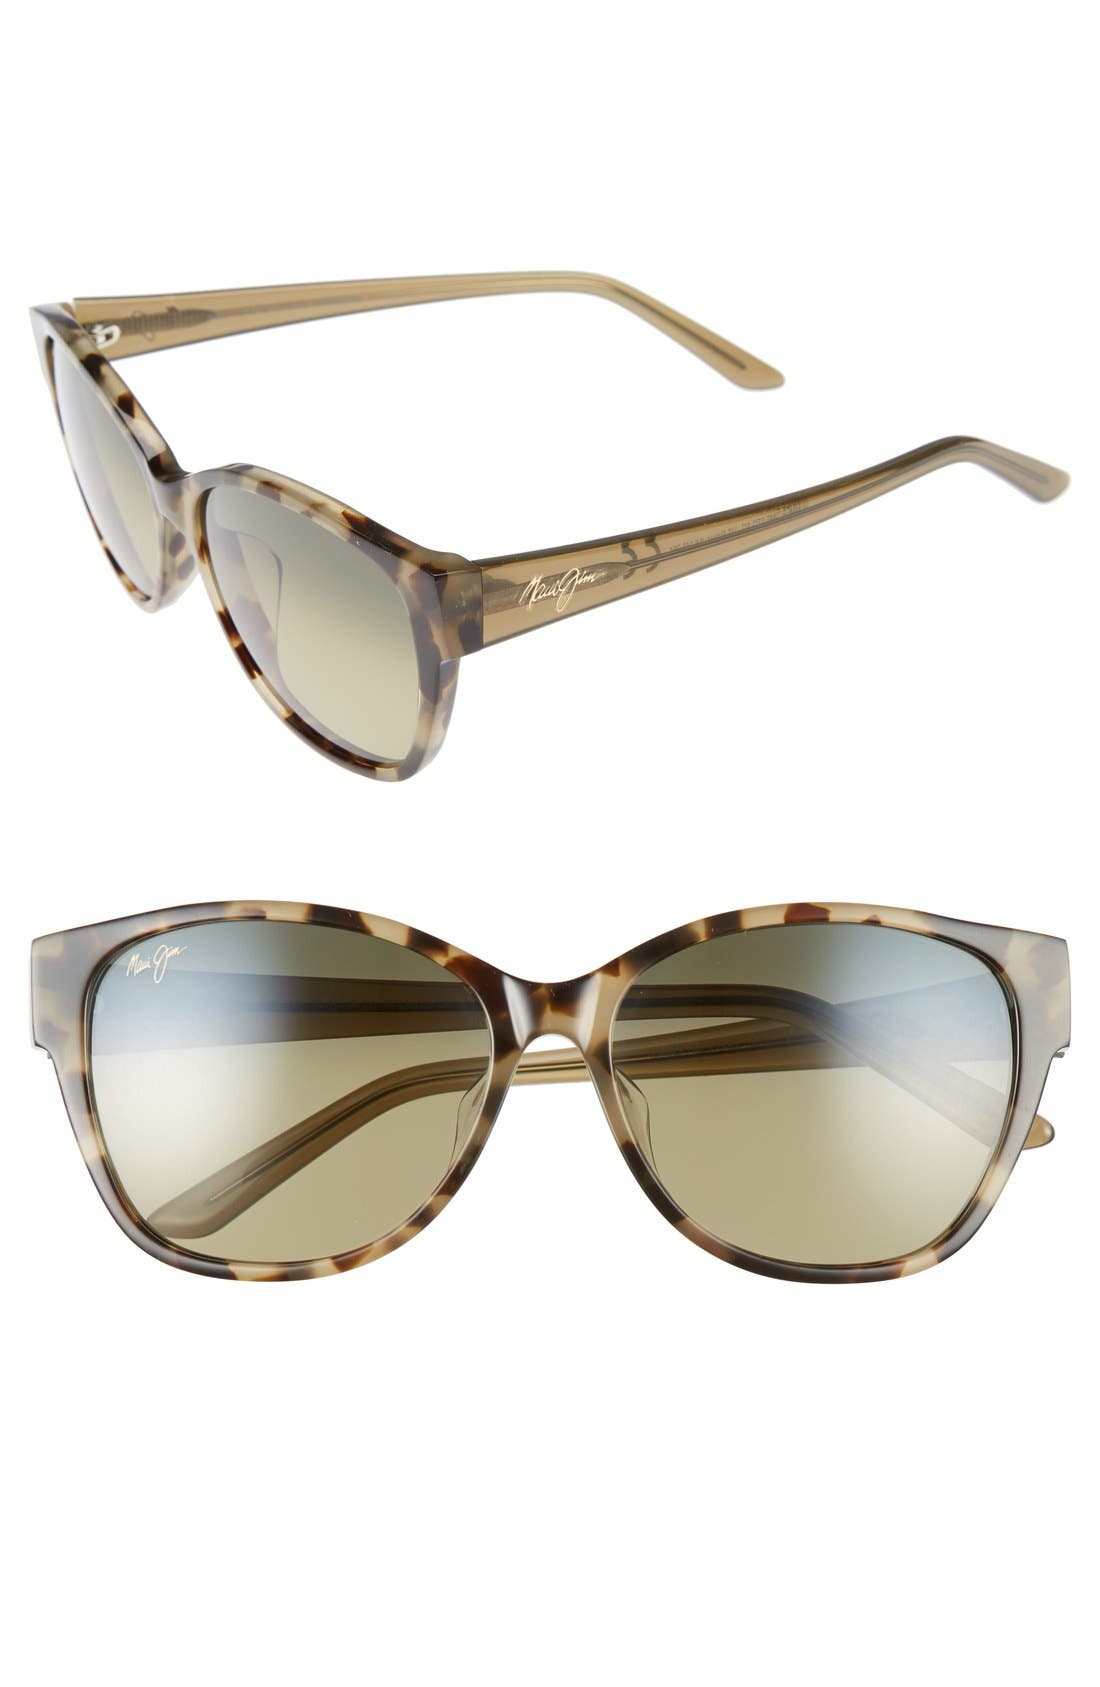 Maui Jim Summer Time 5m Polarizedplus2 Cat Eye Sunglasses - Olive Tokyo Tortoise